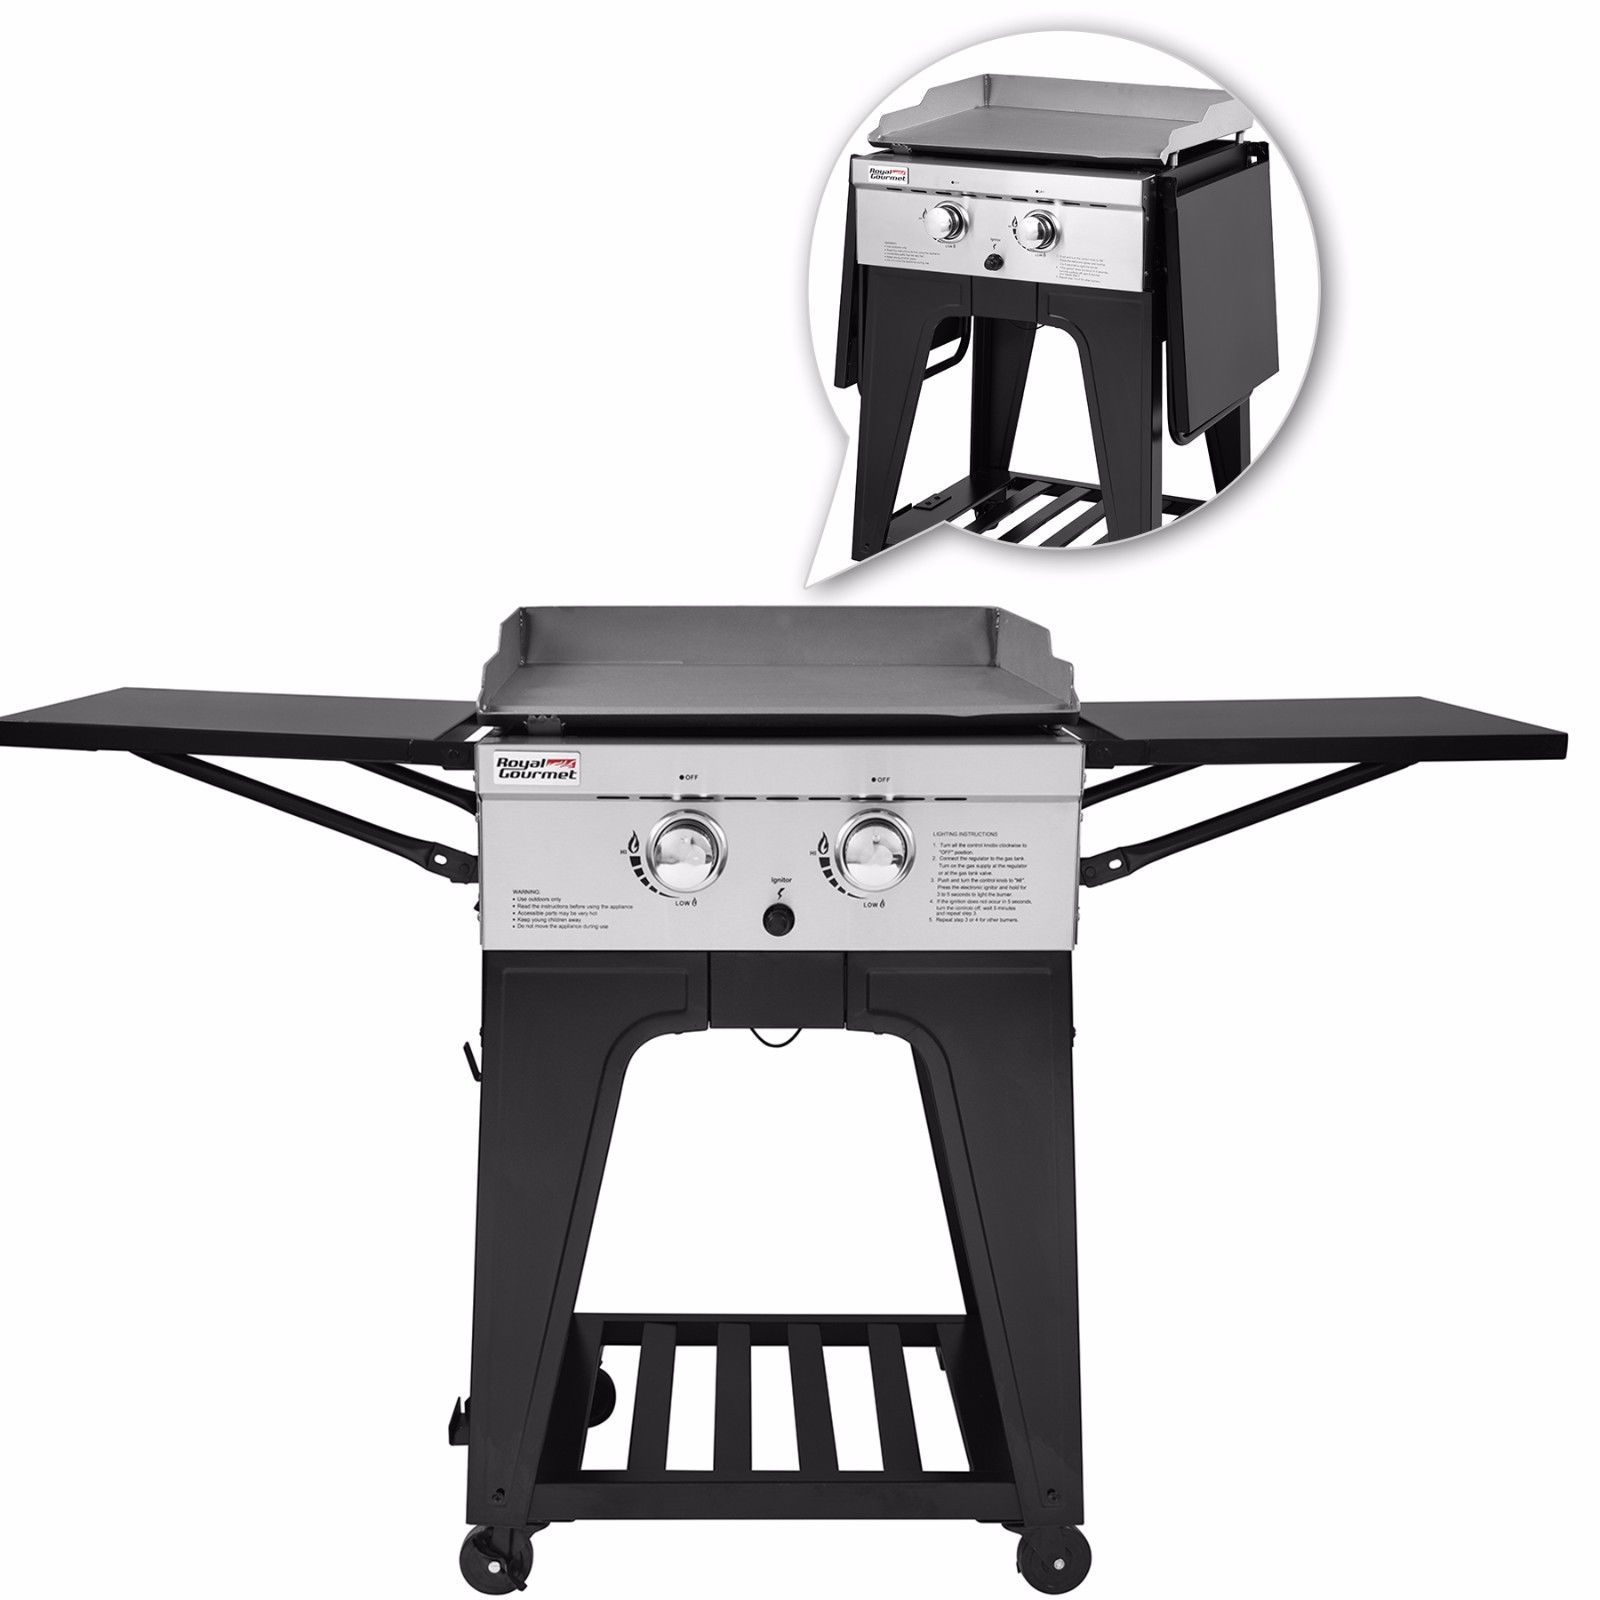 Royal Gourmet GB2000 2-Burner BBQ Gas Propane Grill Griddle